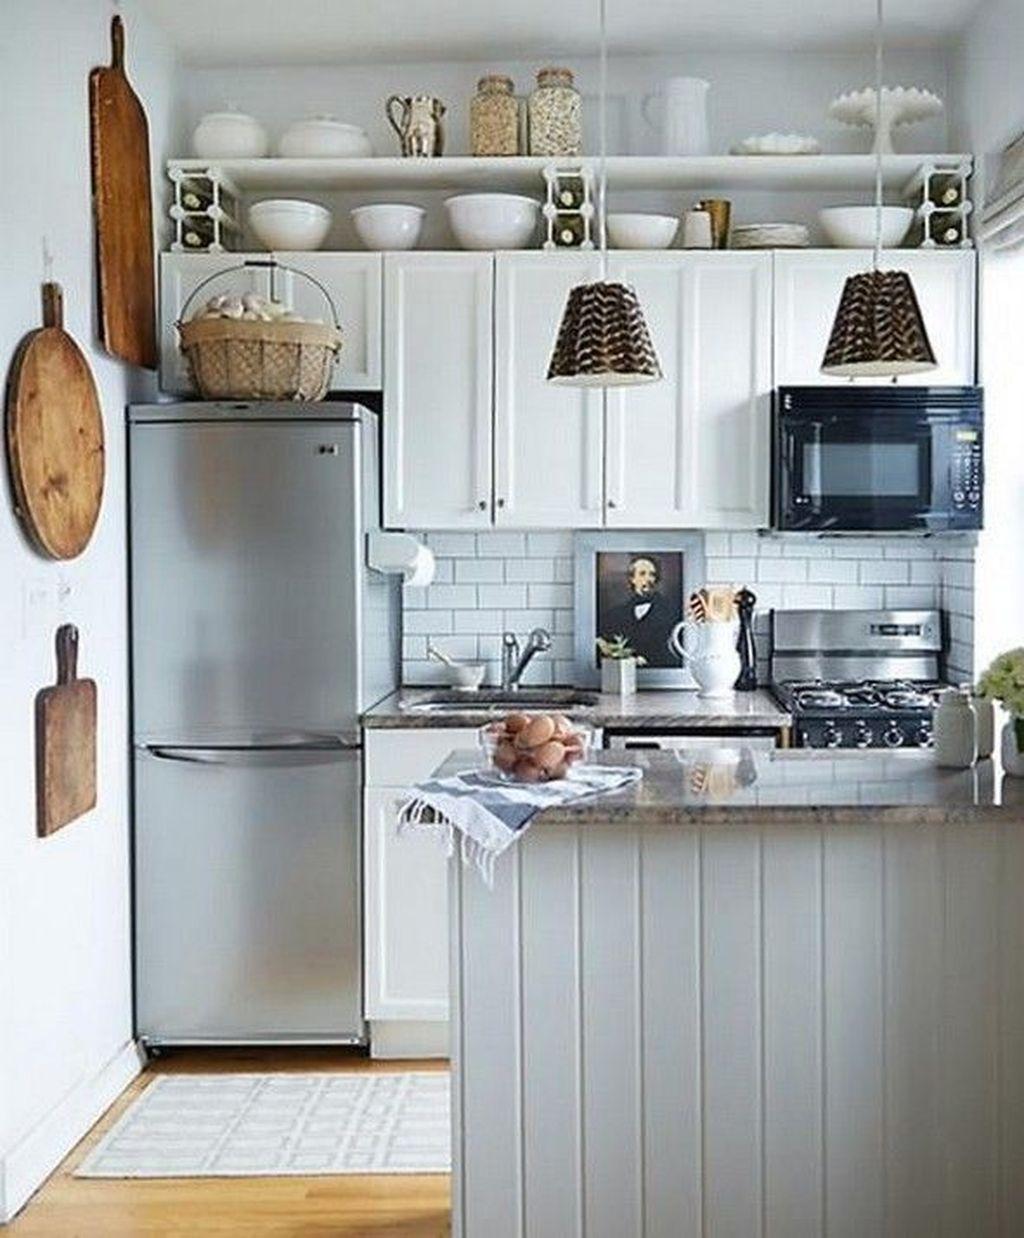 Brilliant Small Kitchen Remodel Design Ideas On A Budget 23